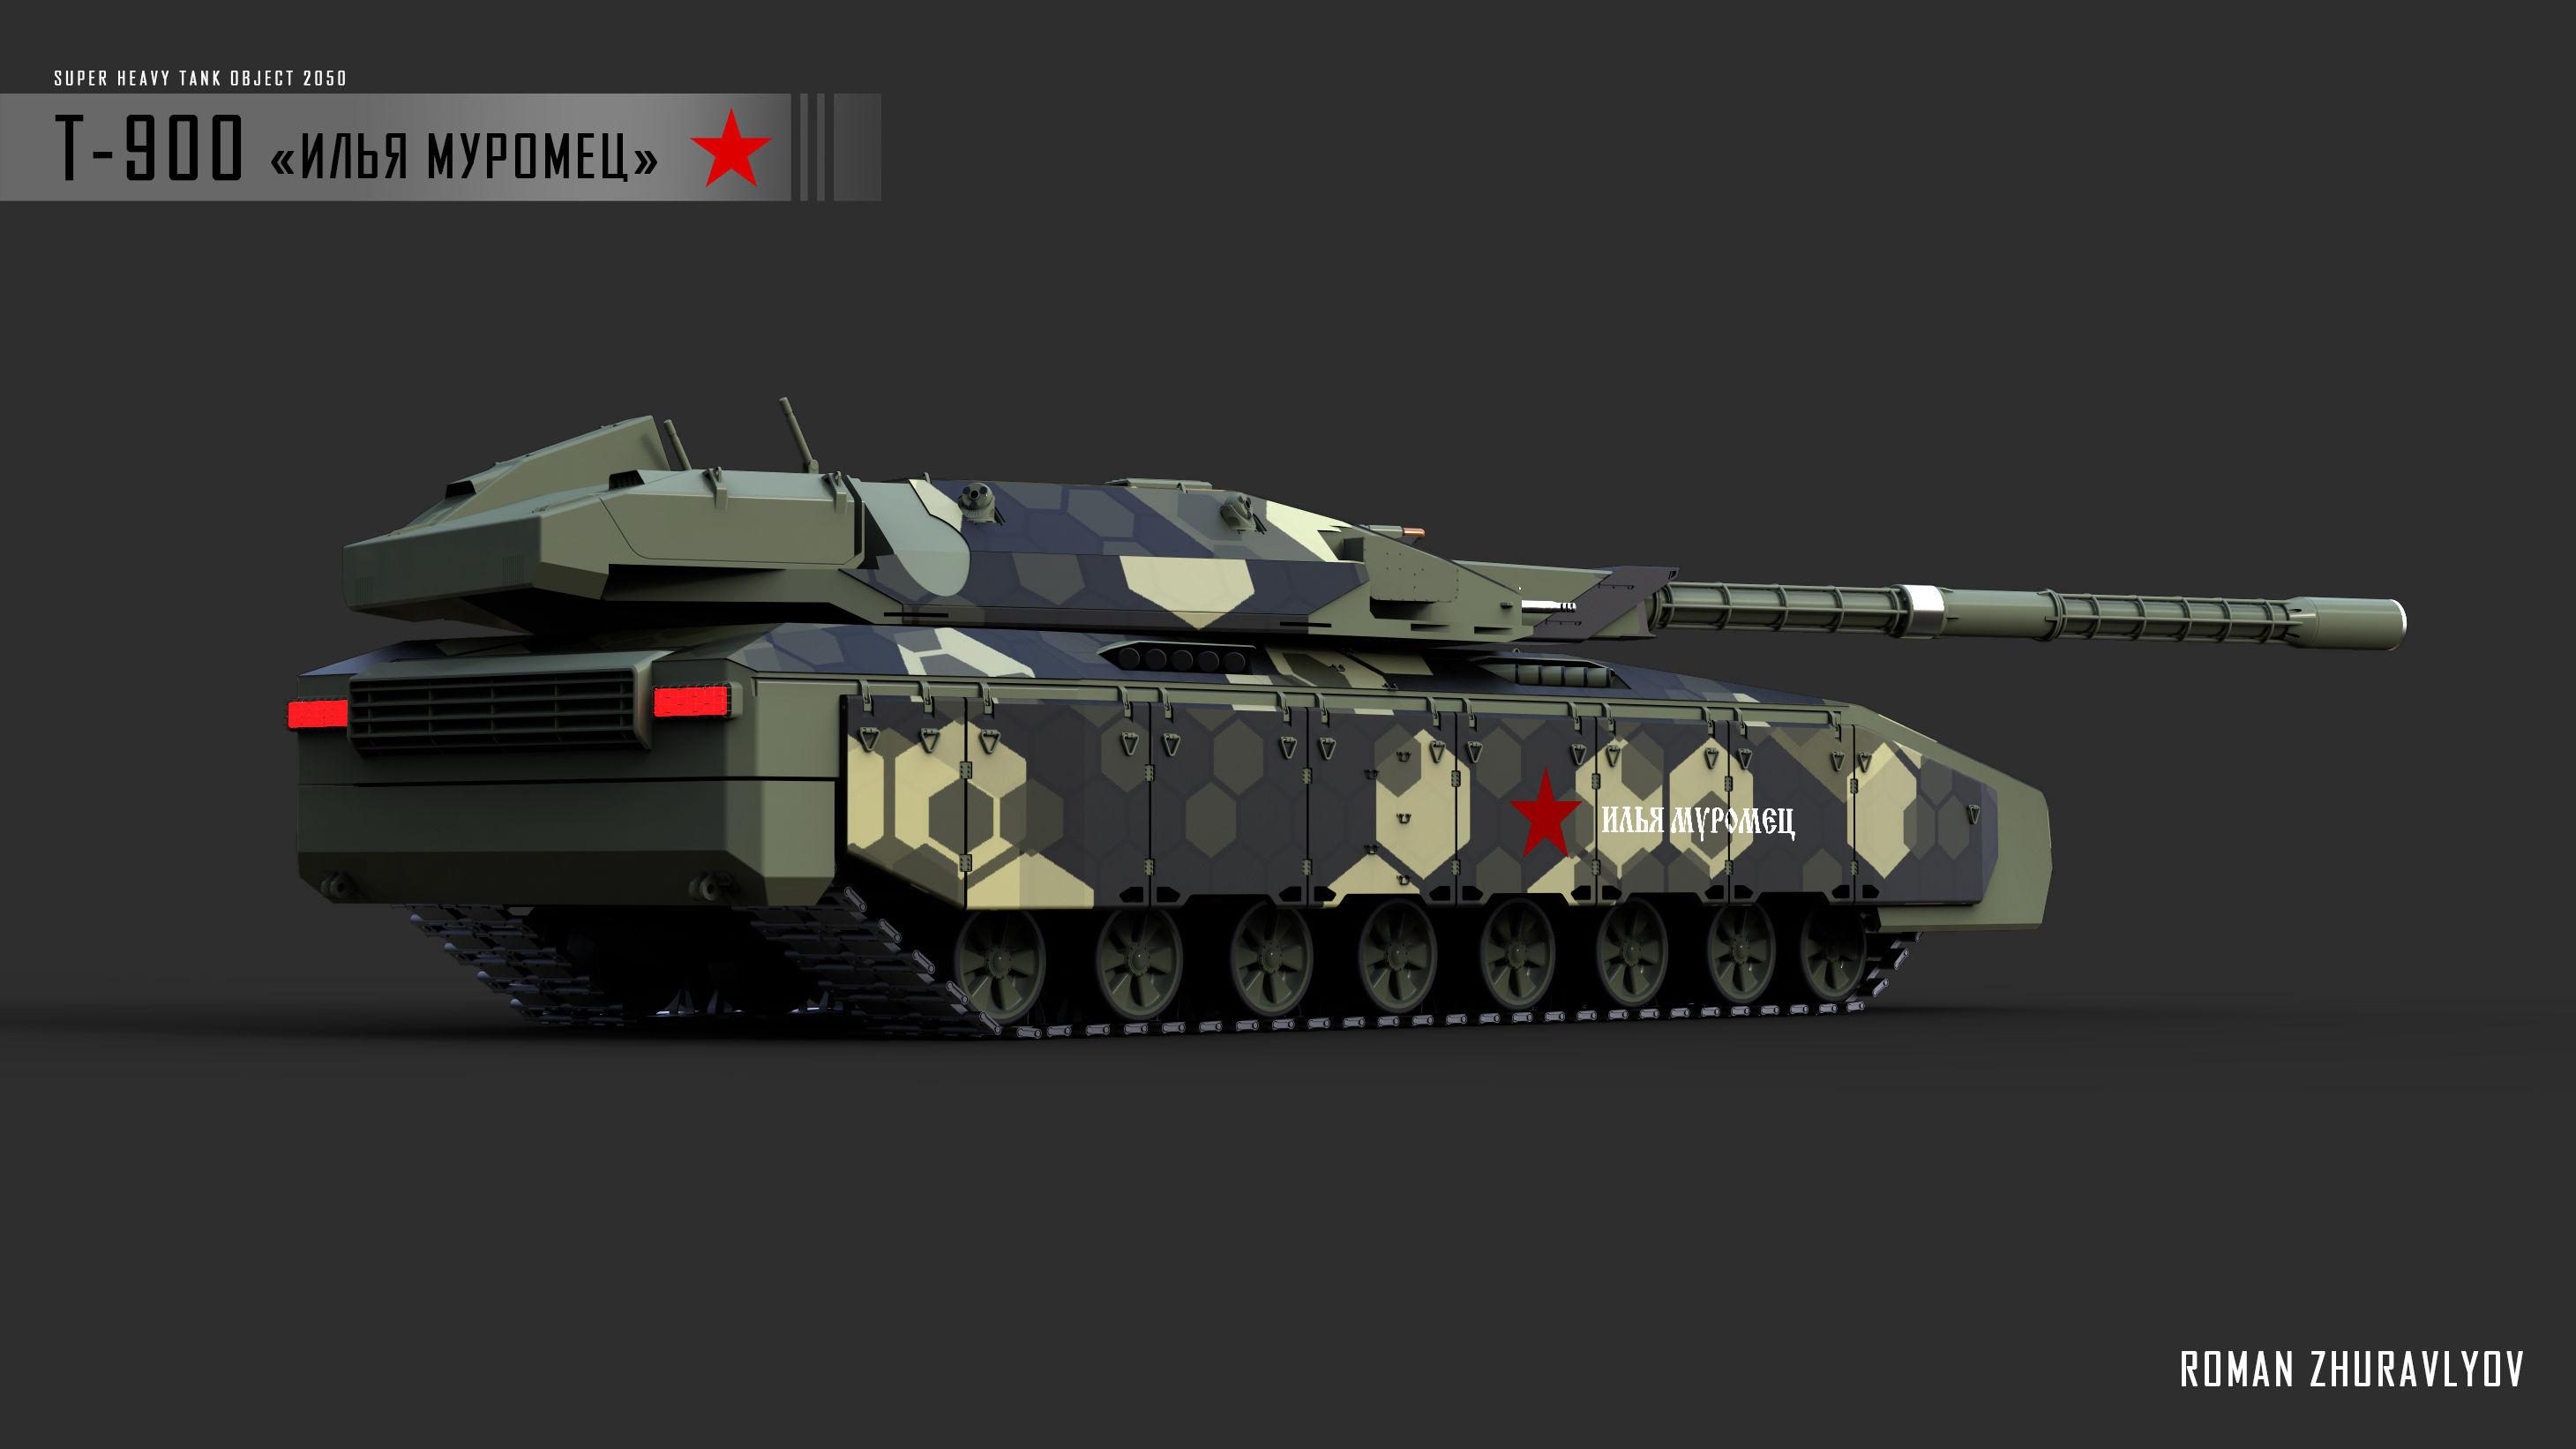 T-900-3-3500-3500